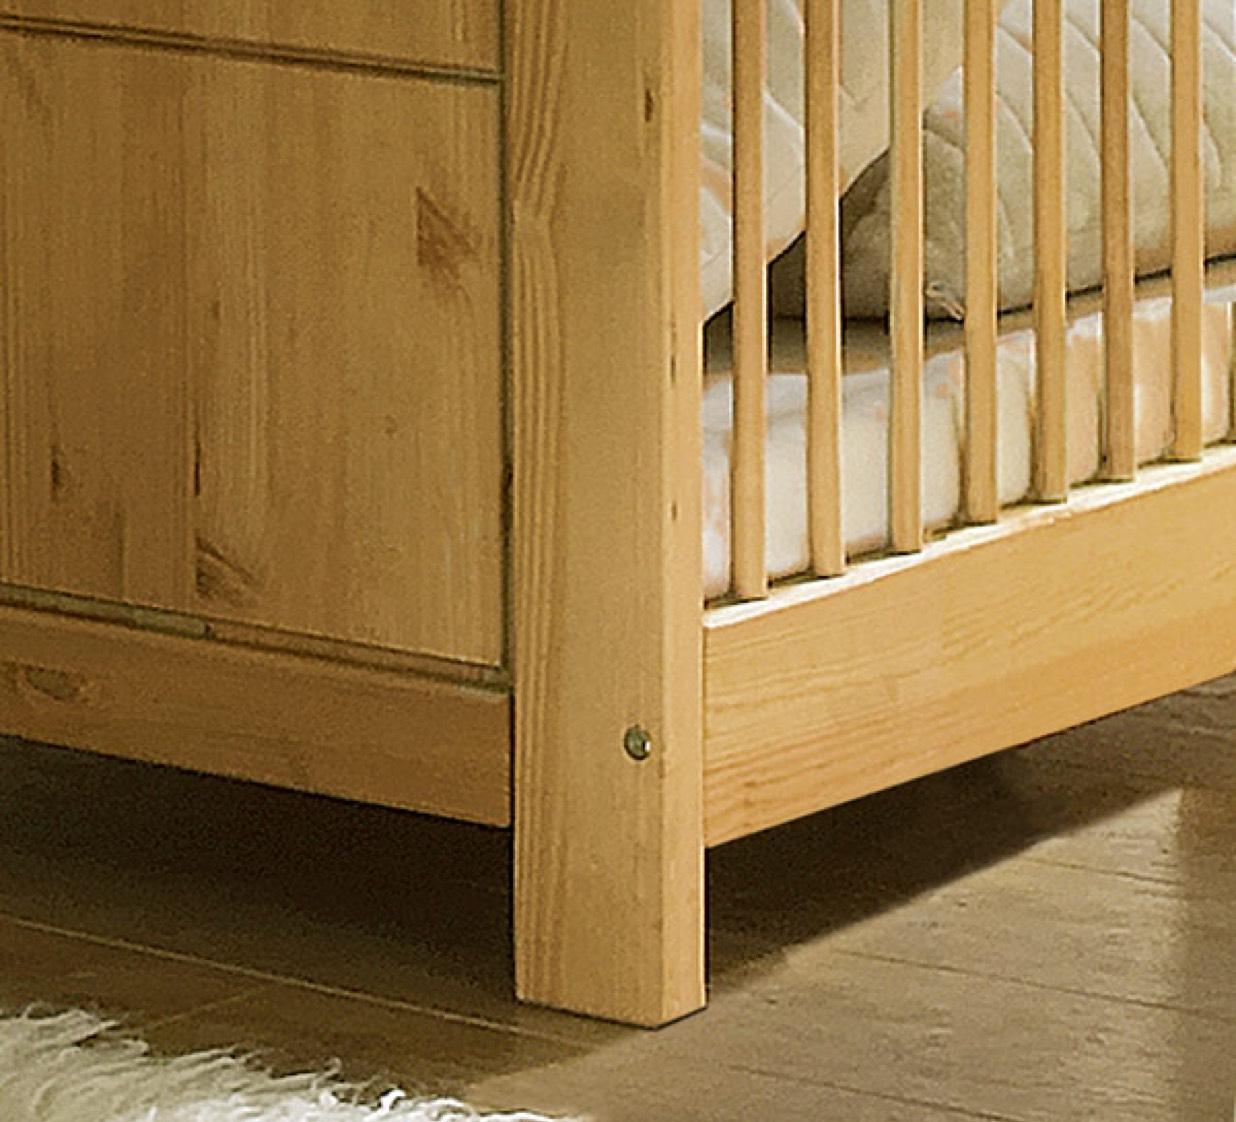 lattenroste allnatura bettdecken bergr e 135x220 ikea schlafsofas mit bettkasten mickey mouse. Black Bedroom Furniture Sets. Home Design Ideas